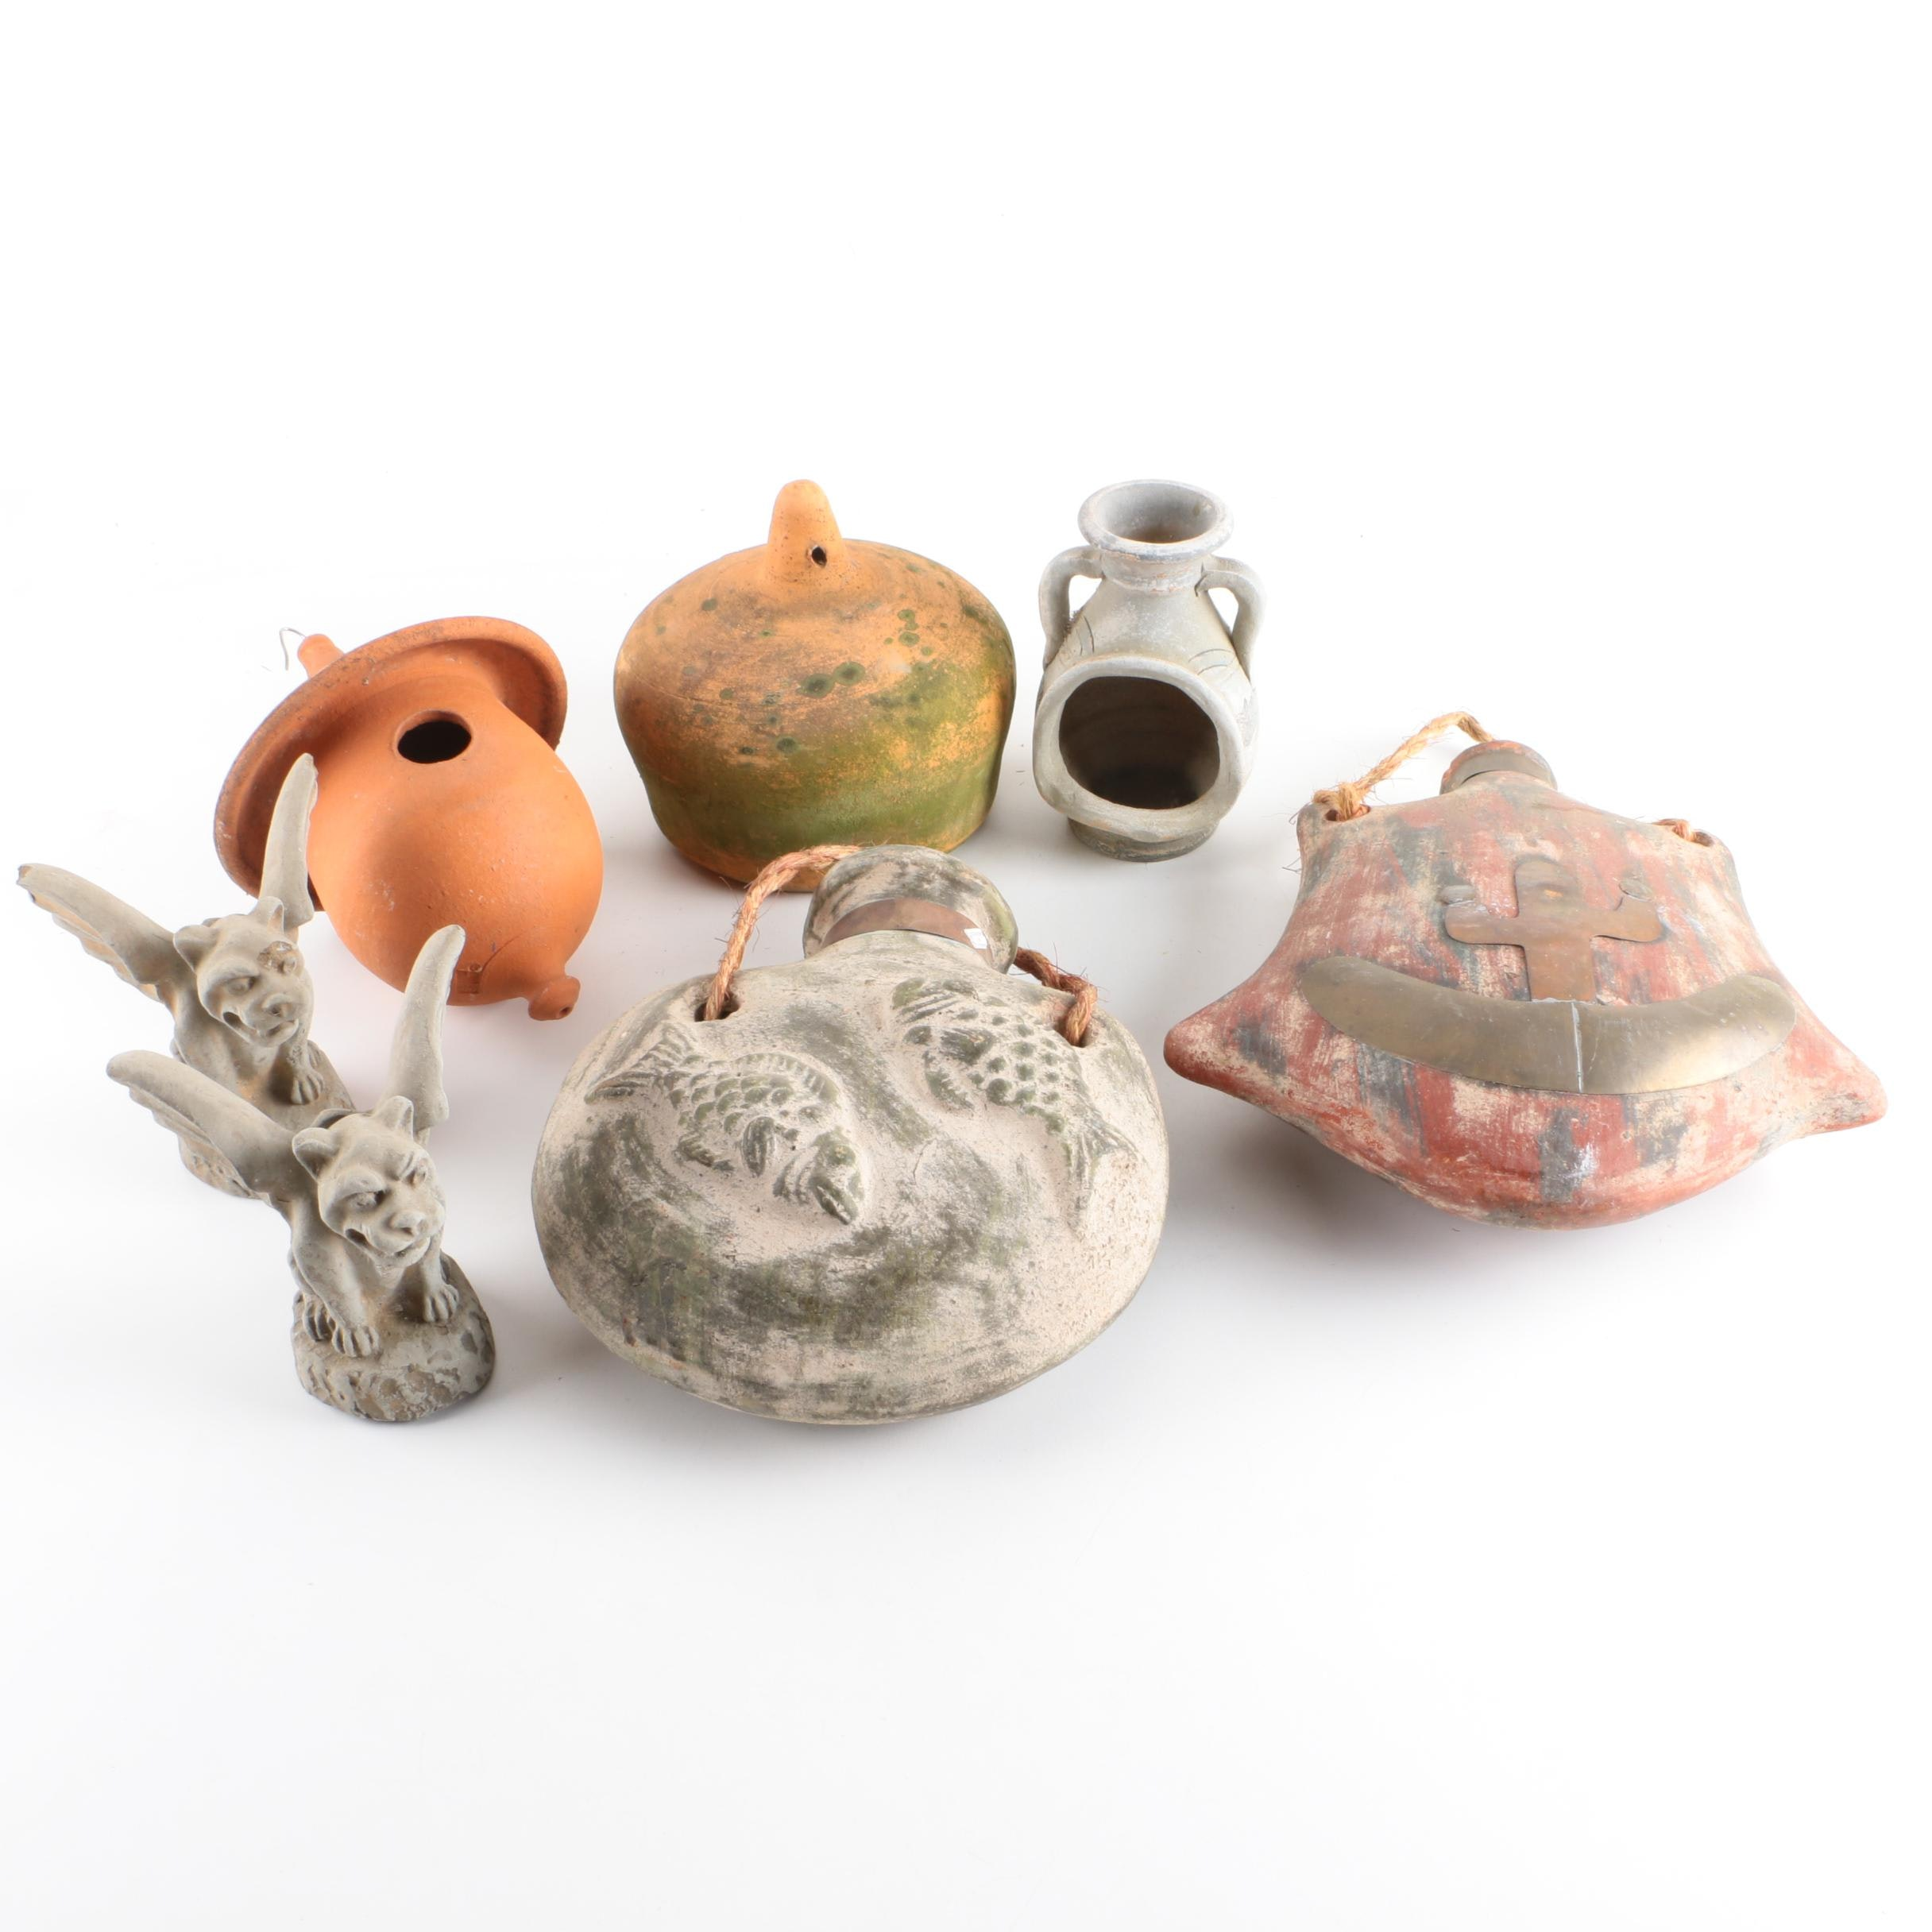 Ceramic Birdhouses and Garden Decor